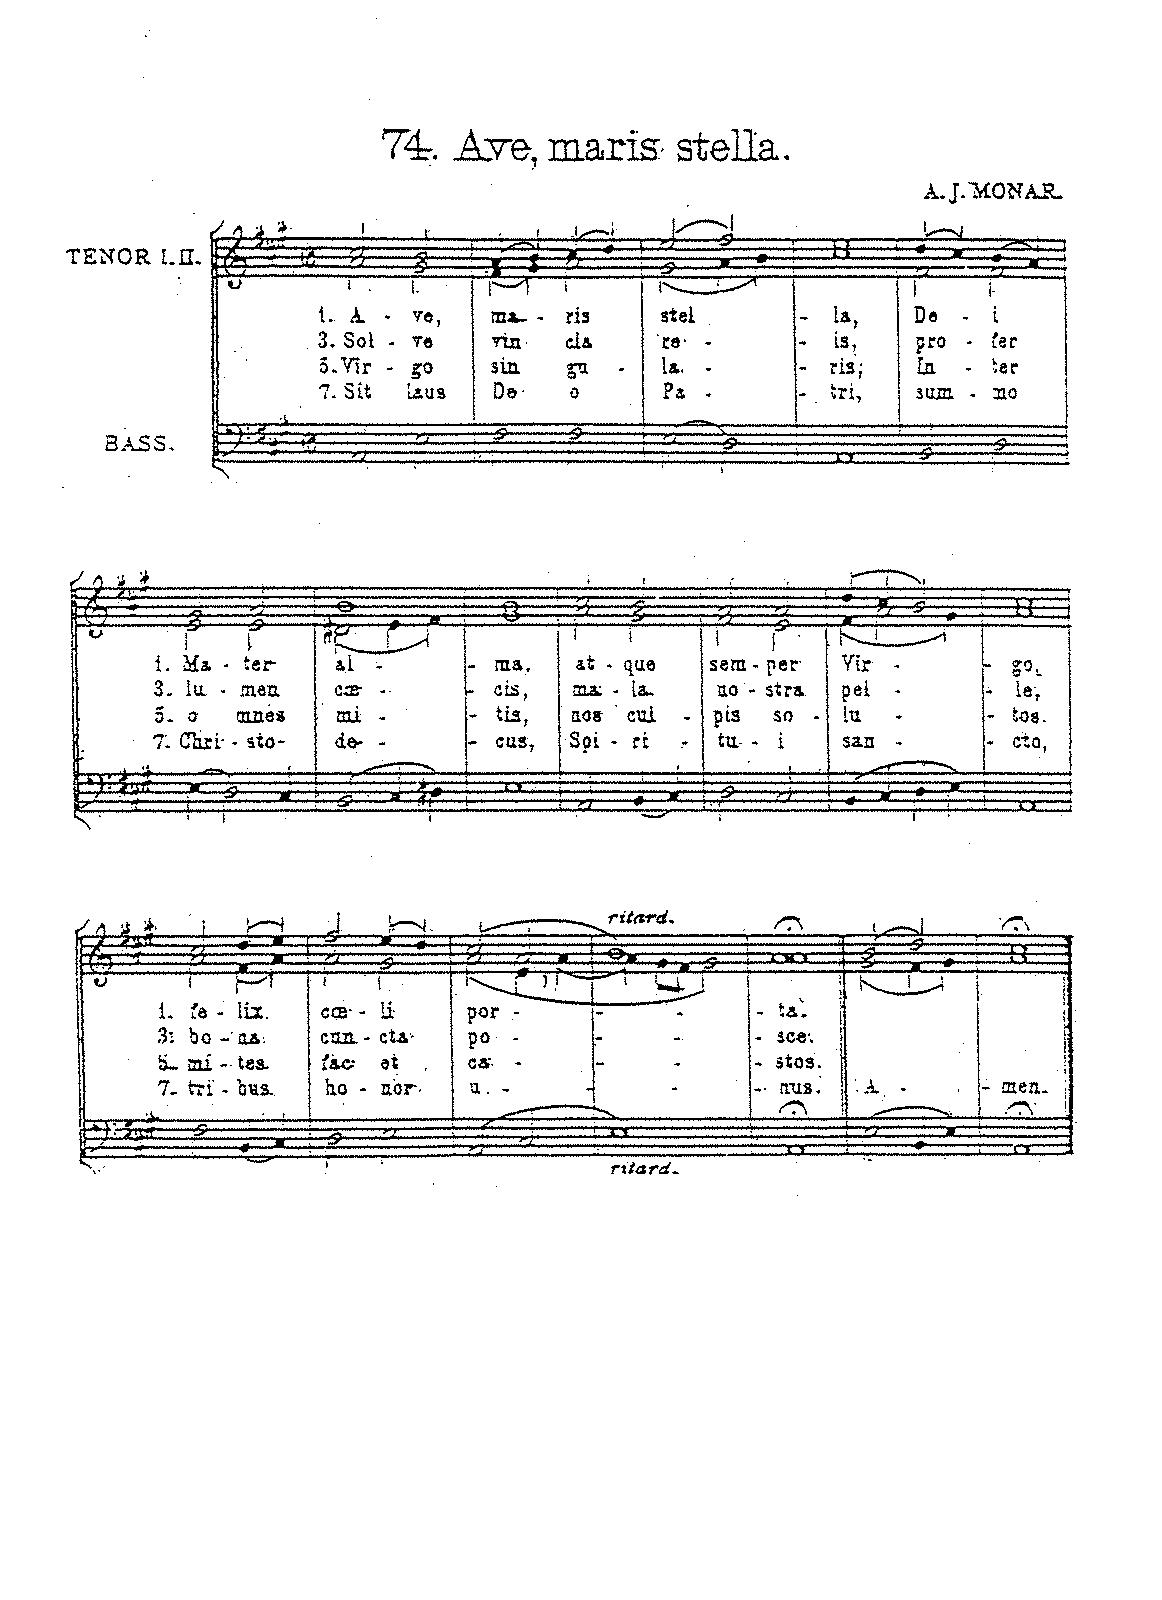 Ave maris stella (Monar, Arnold Joseph) - IMSLP/Petrucci Music